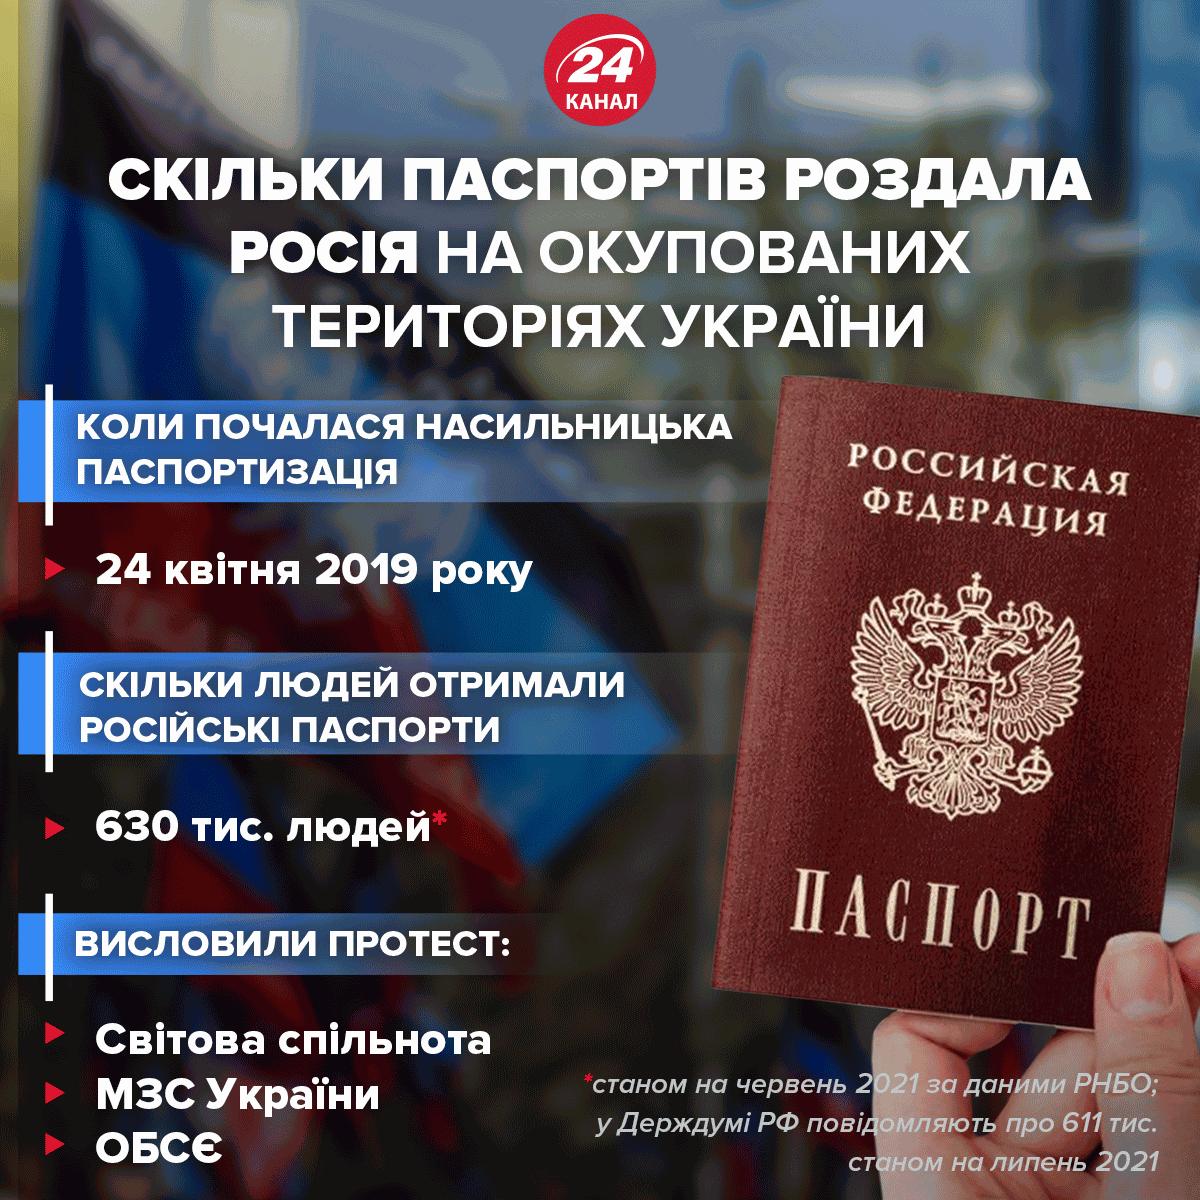 Незаконна паспортизація в ОРДЛО